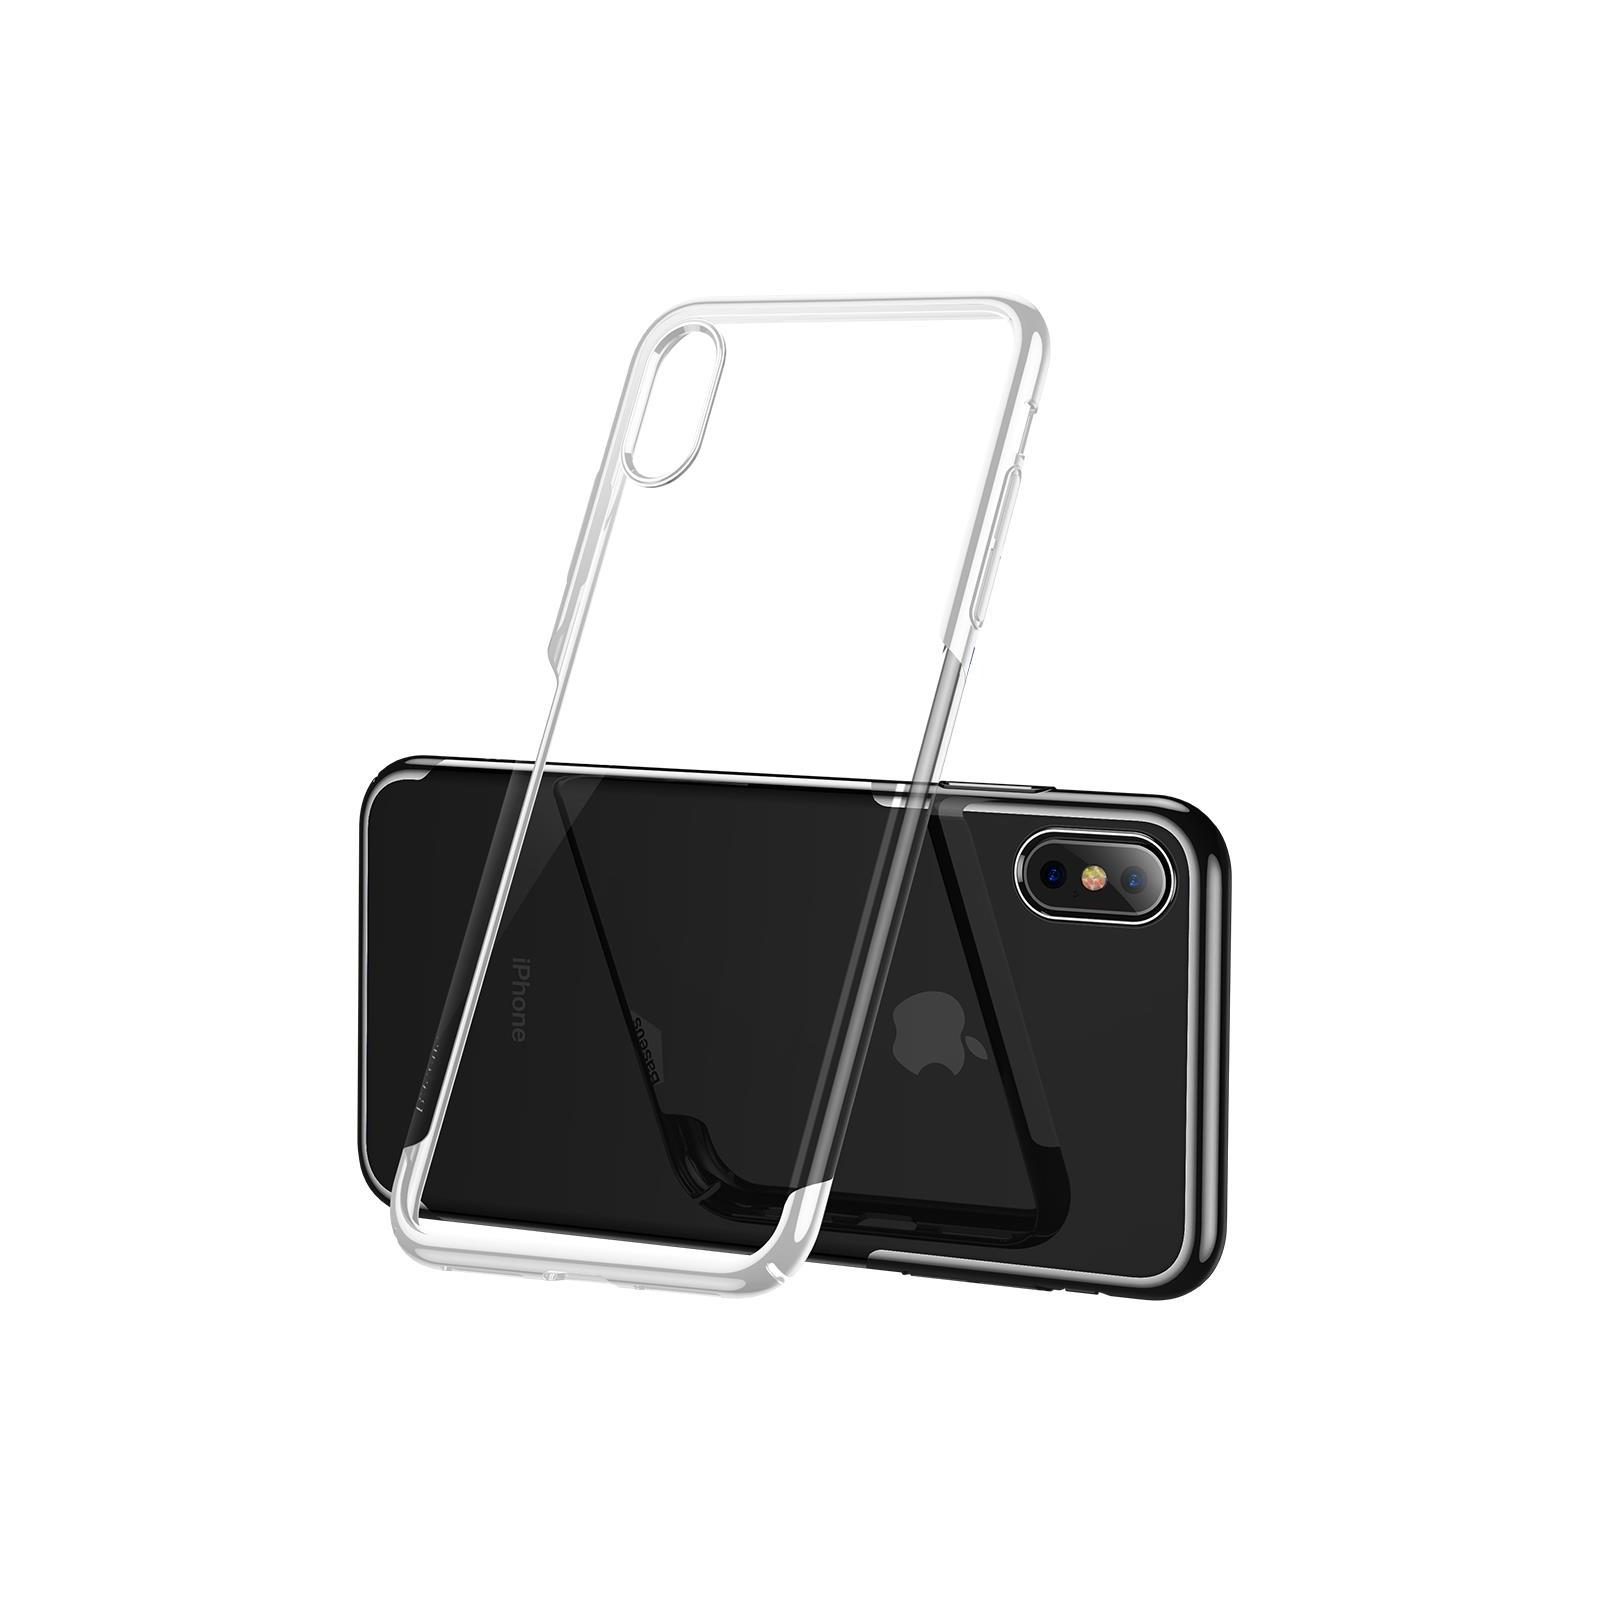 Чохол до моб. телефона Baseus iPhone XS Glitter , White (WIAPIPH58-DW02) зображення 2